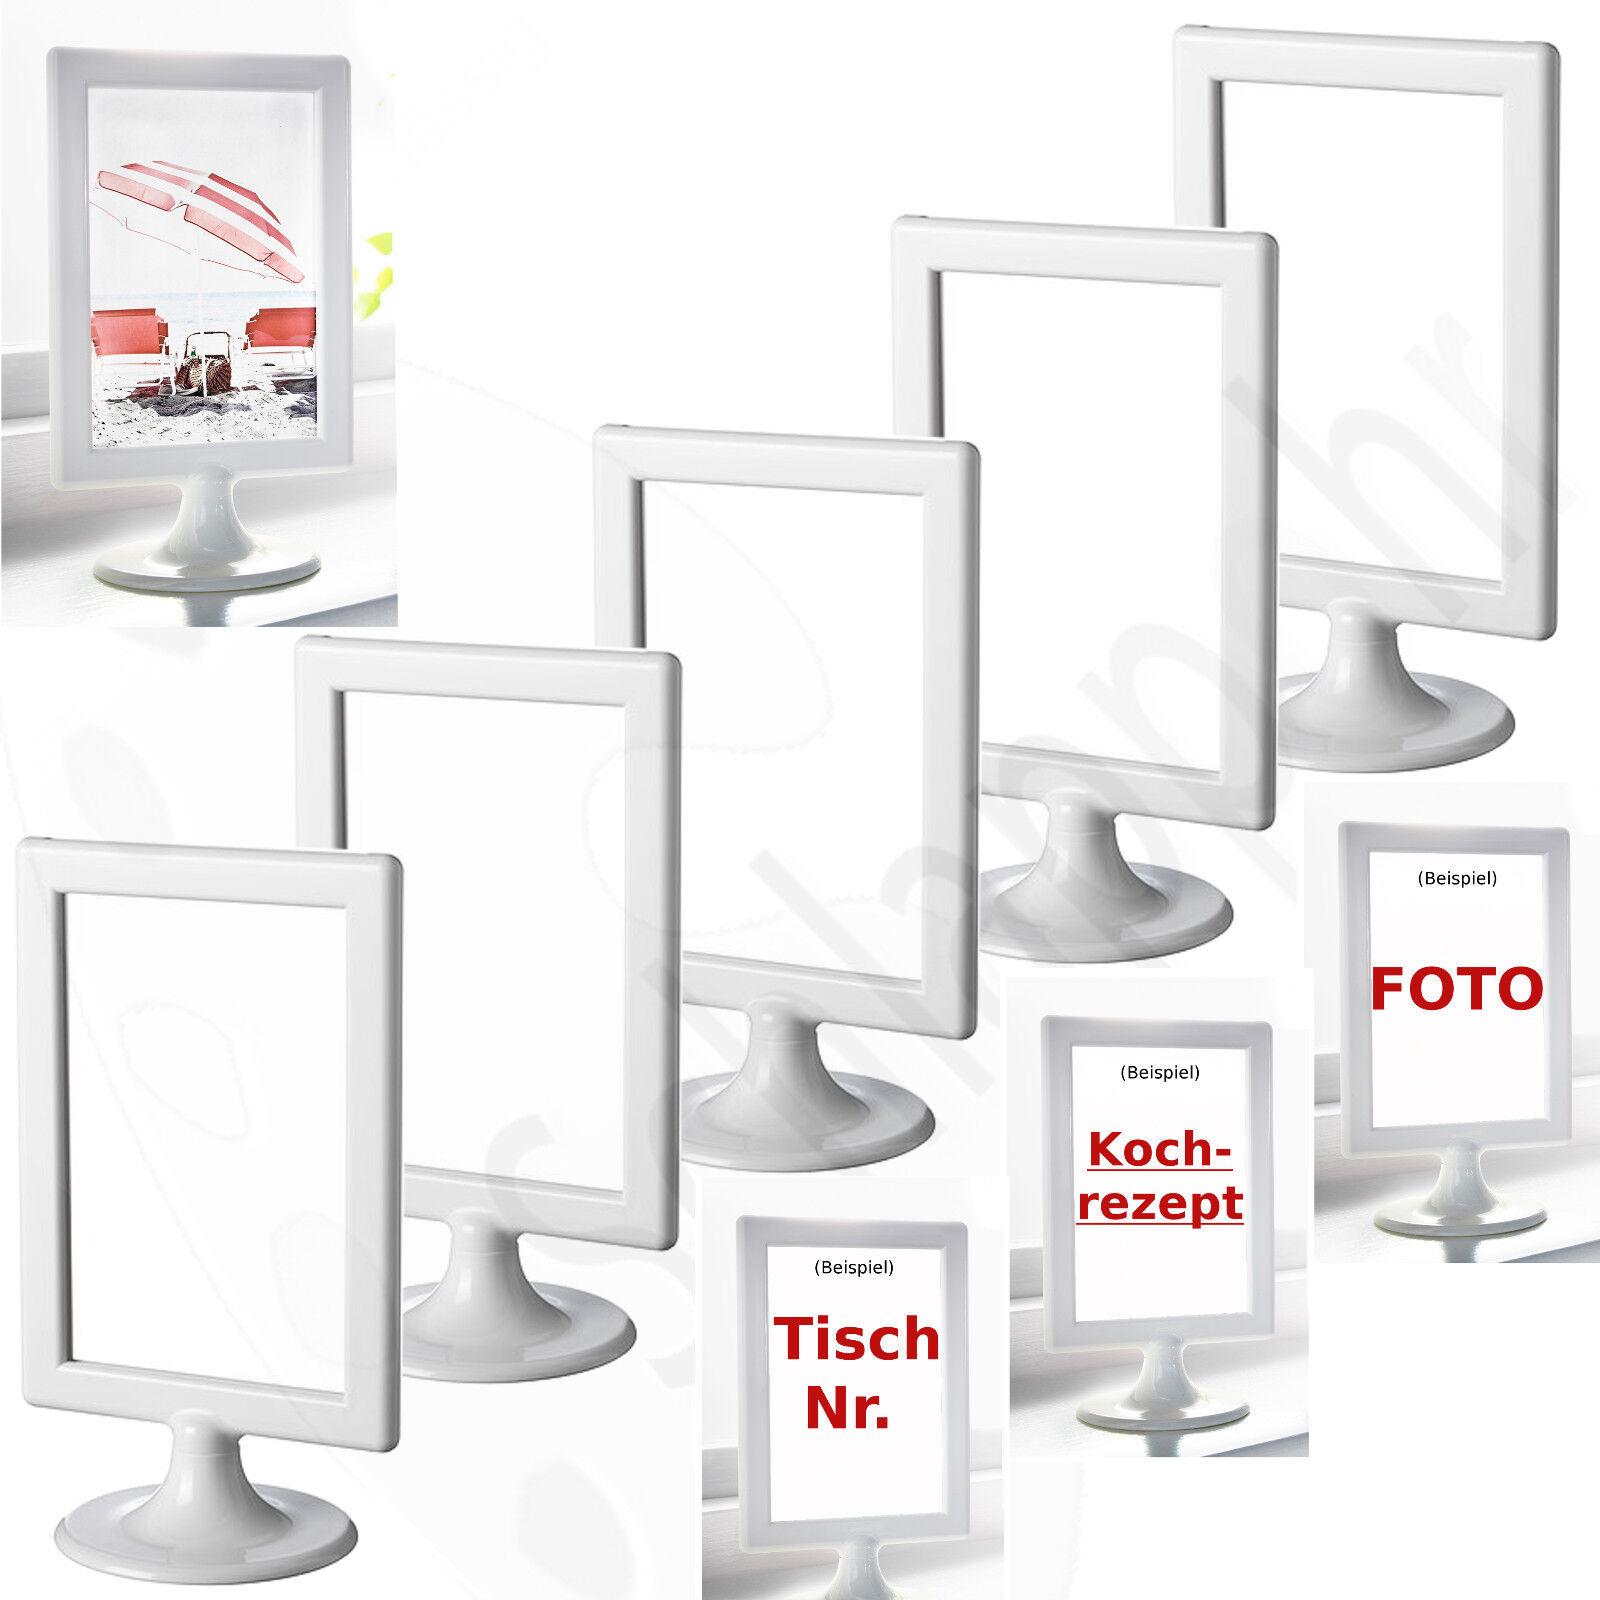 5 Stück Set IKEA TOLSBY 10x15 cm. Weiß/ Bilderrahmen/ Doppelrahmen ...